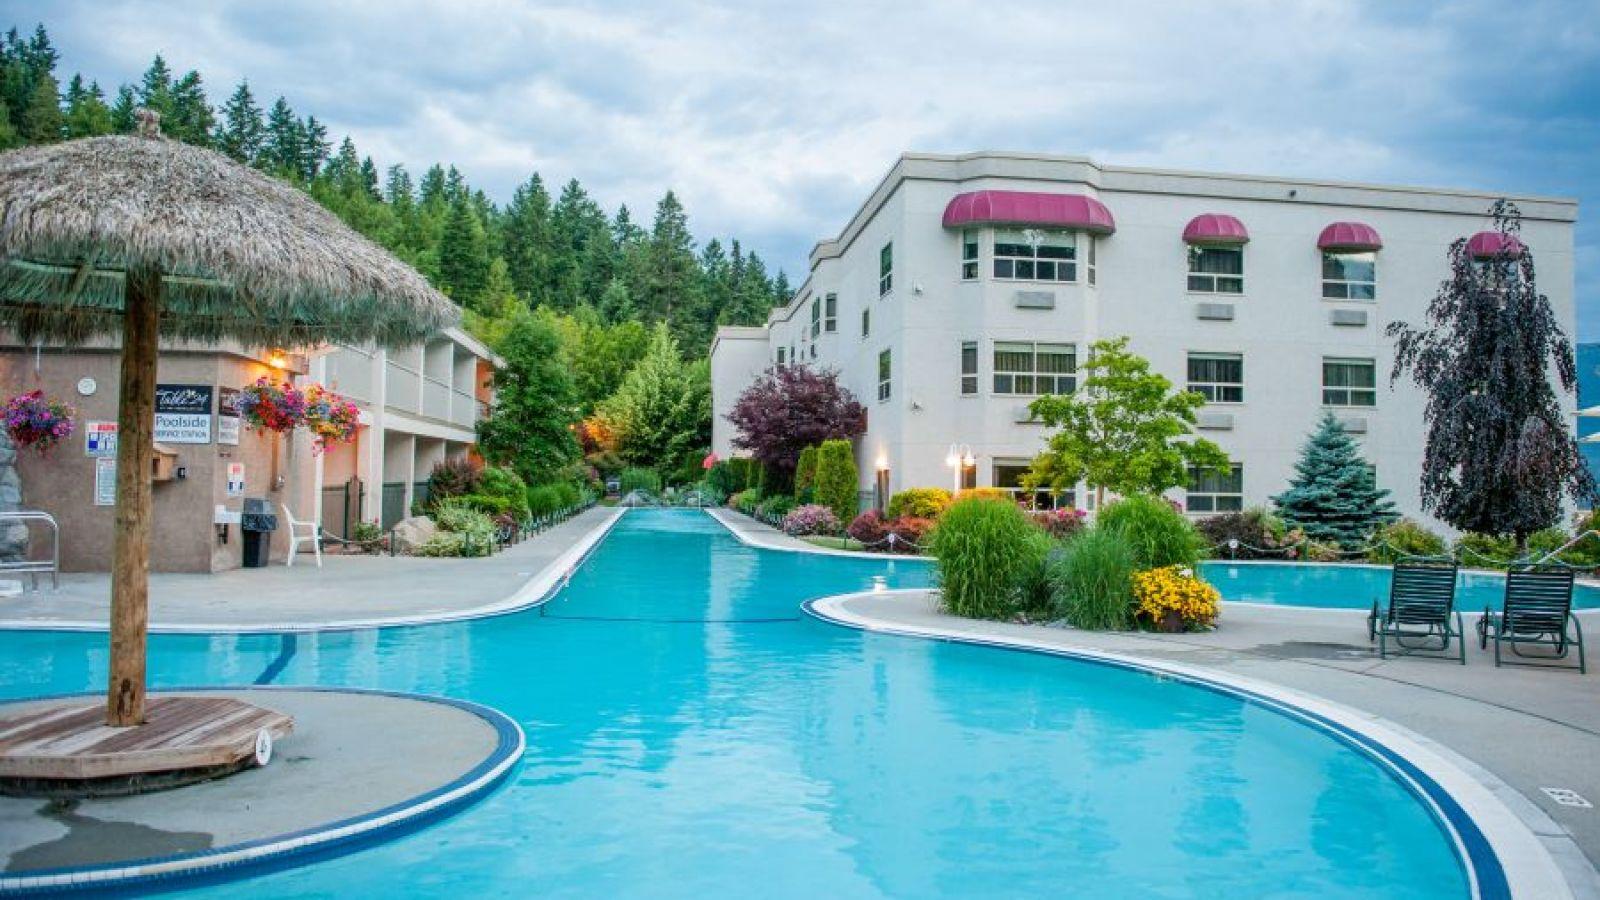 Pool area at the Hilltop Inn Salmon Arm